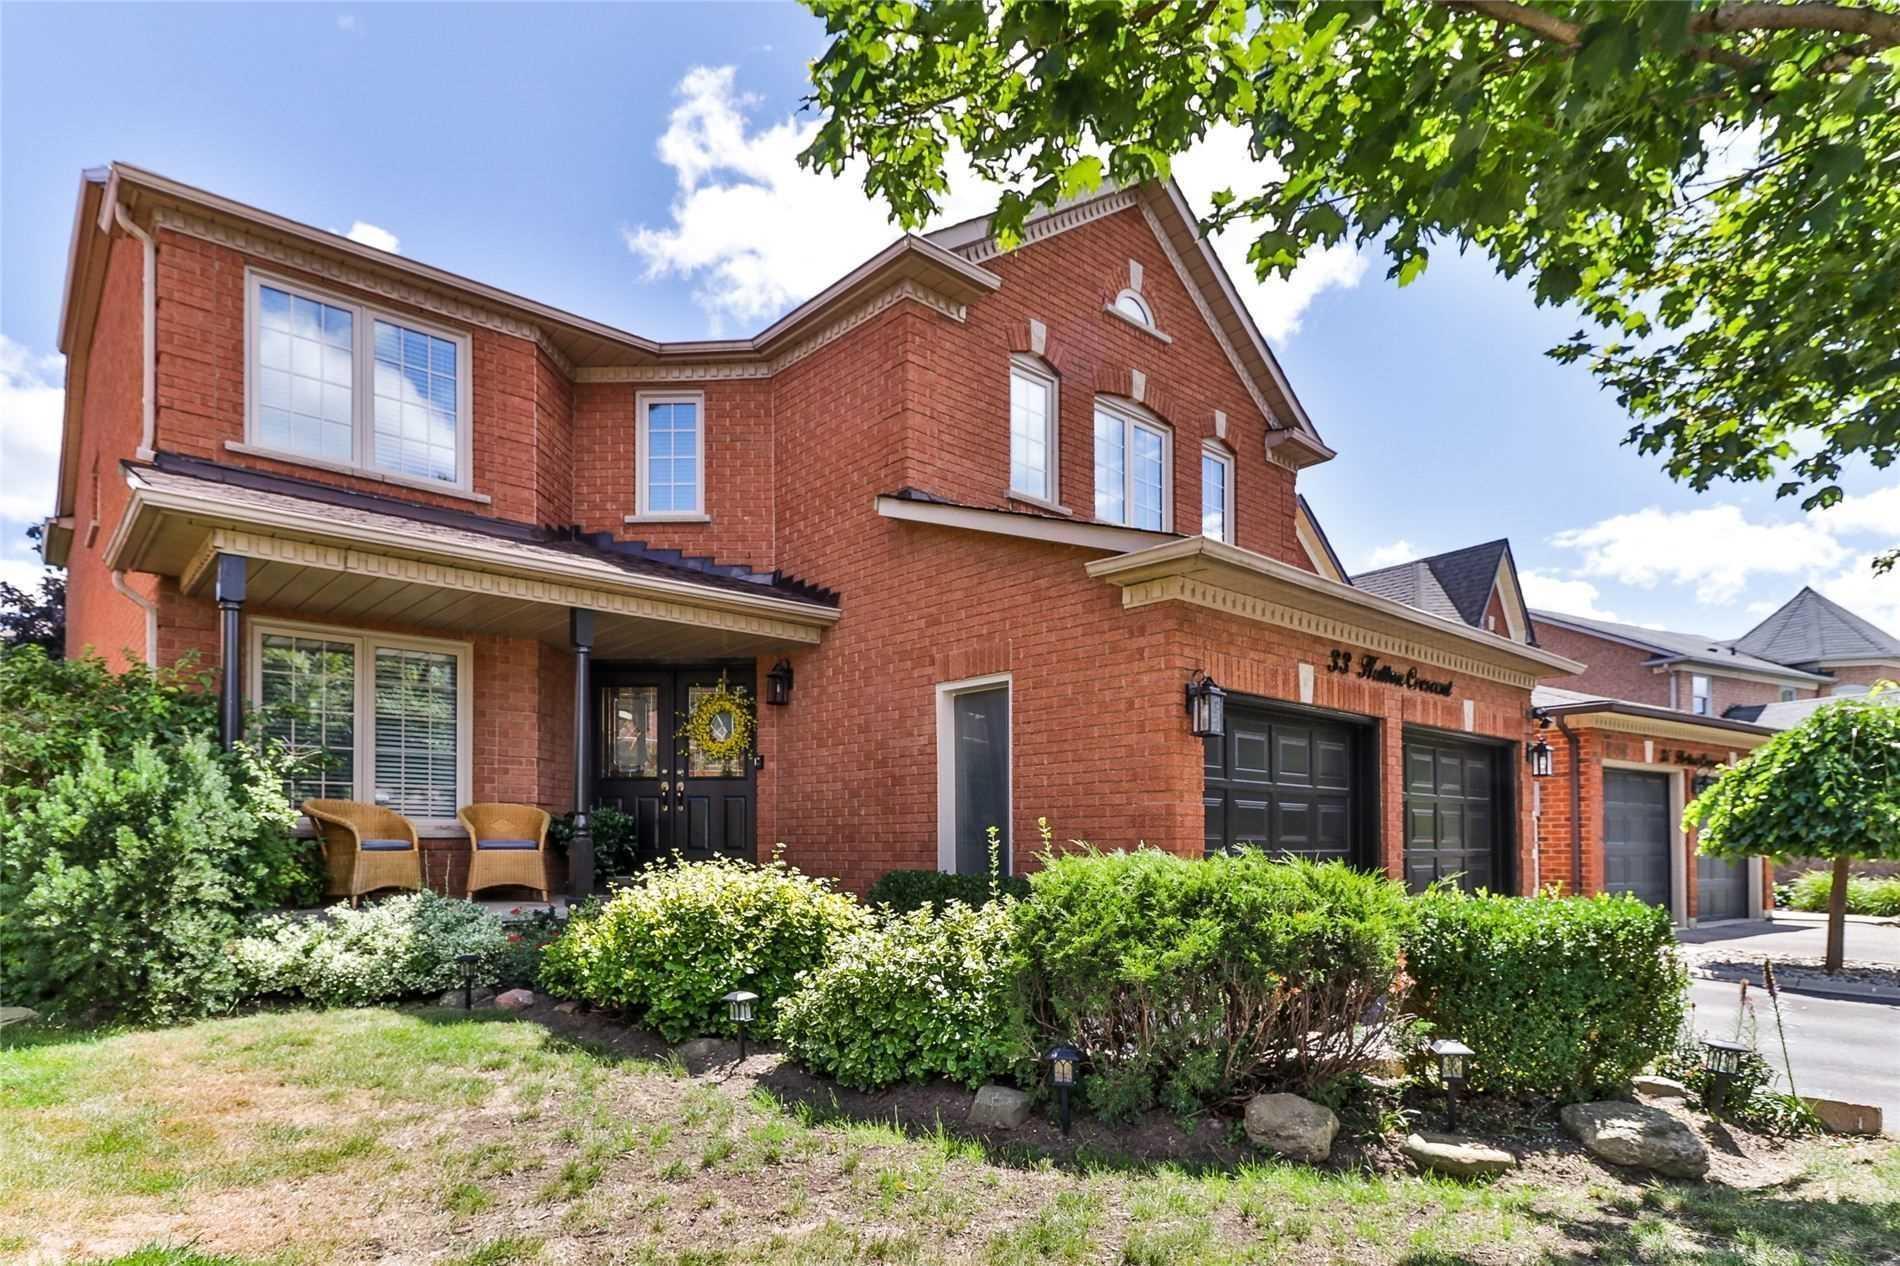 33 Hutton Cres, Caledon, Ontario L7C 1A3, 5 Bedrooms Bedrooms, 11 Rooms Rooms,4 BathroomsBathrooms,Detached,For Sale,Hutton,W4912383